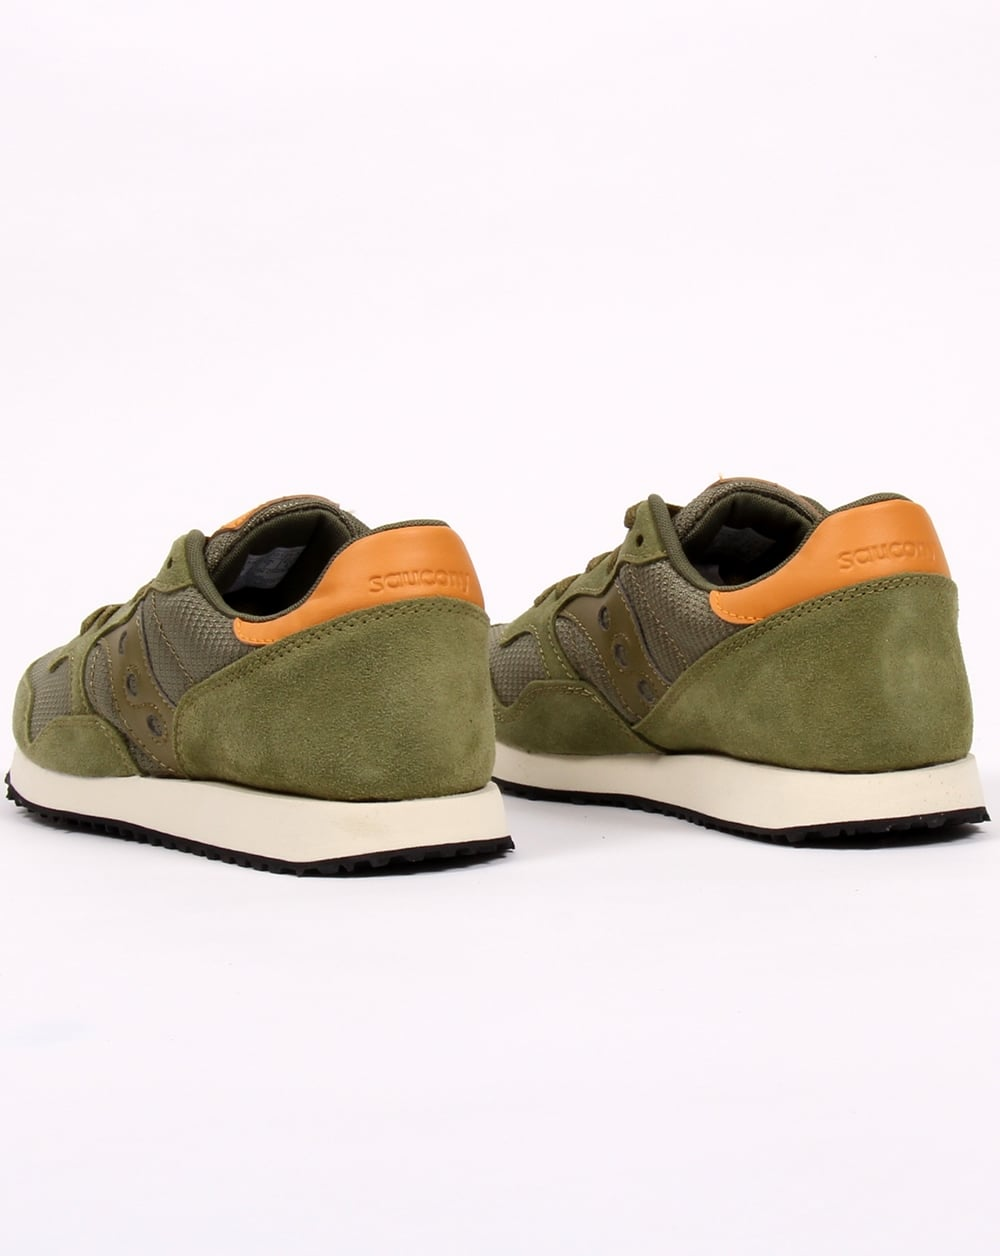 Saucony Originals DXN Trainer Mens Olive F126342EO Shoes